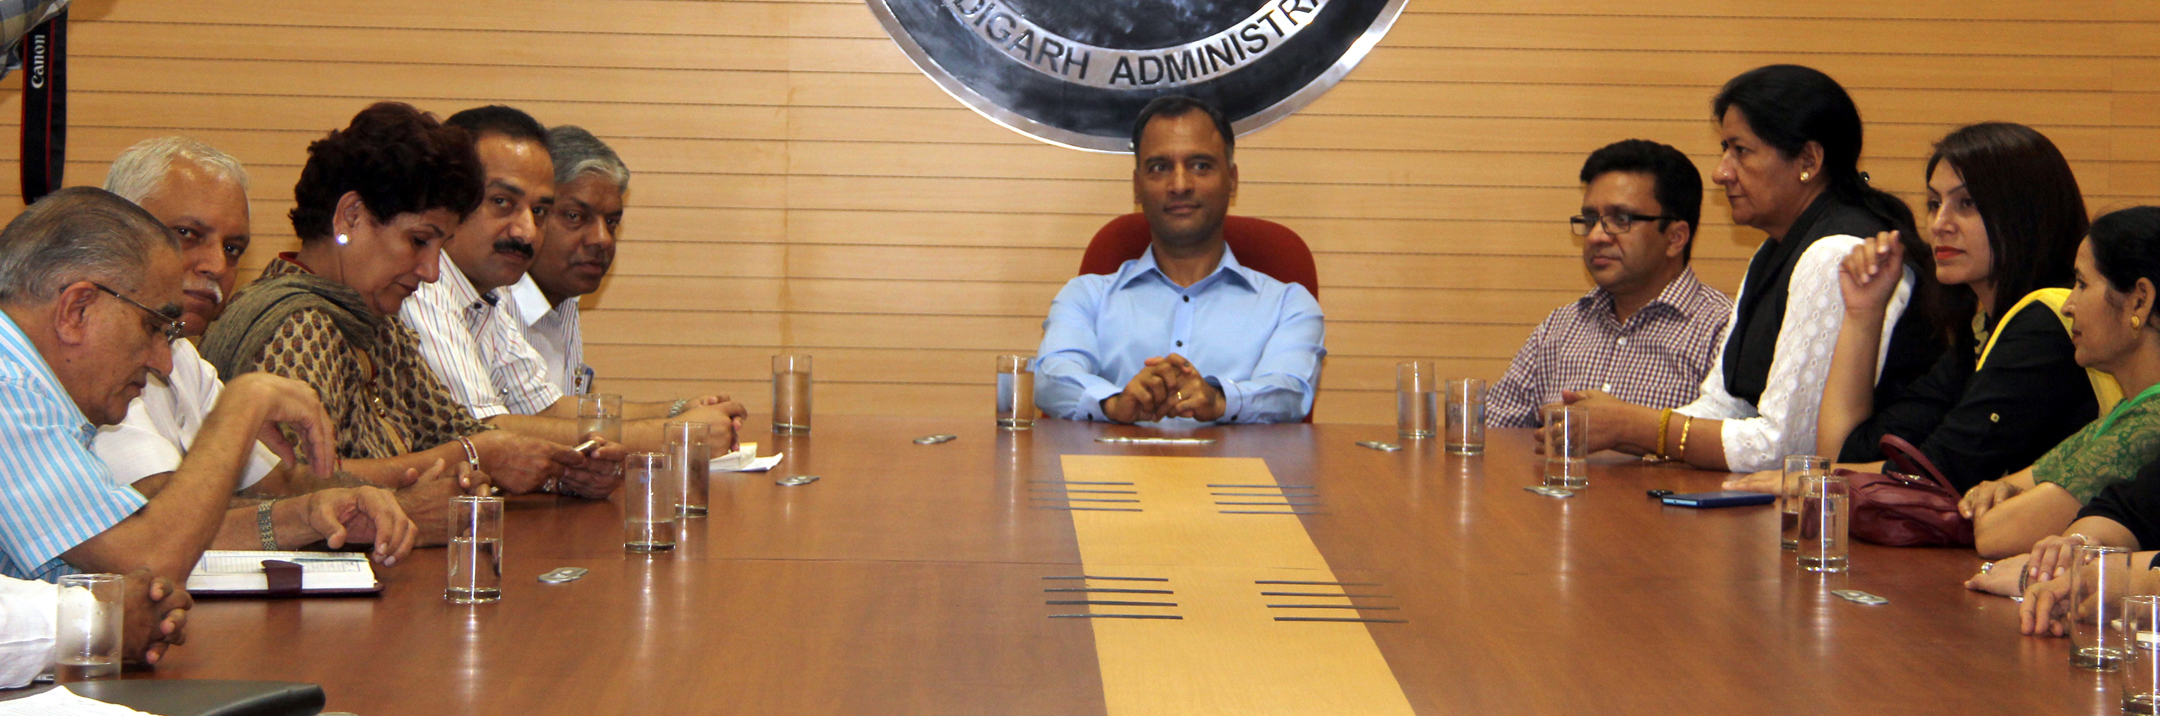 The Adviser to the Administrator, UT, Chandigarh, Mr. Vijay Dev, Mayor, MCC, Mrs. Poonam Sharma, UT Home Secretary, Mr. Anurag Agarwal alongwith councillors in a meeting at UT Secretariat, Chandigarh on Wednesday, July 29, 2015.